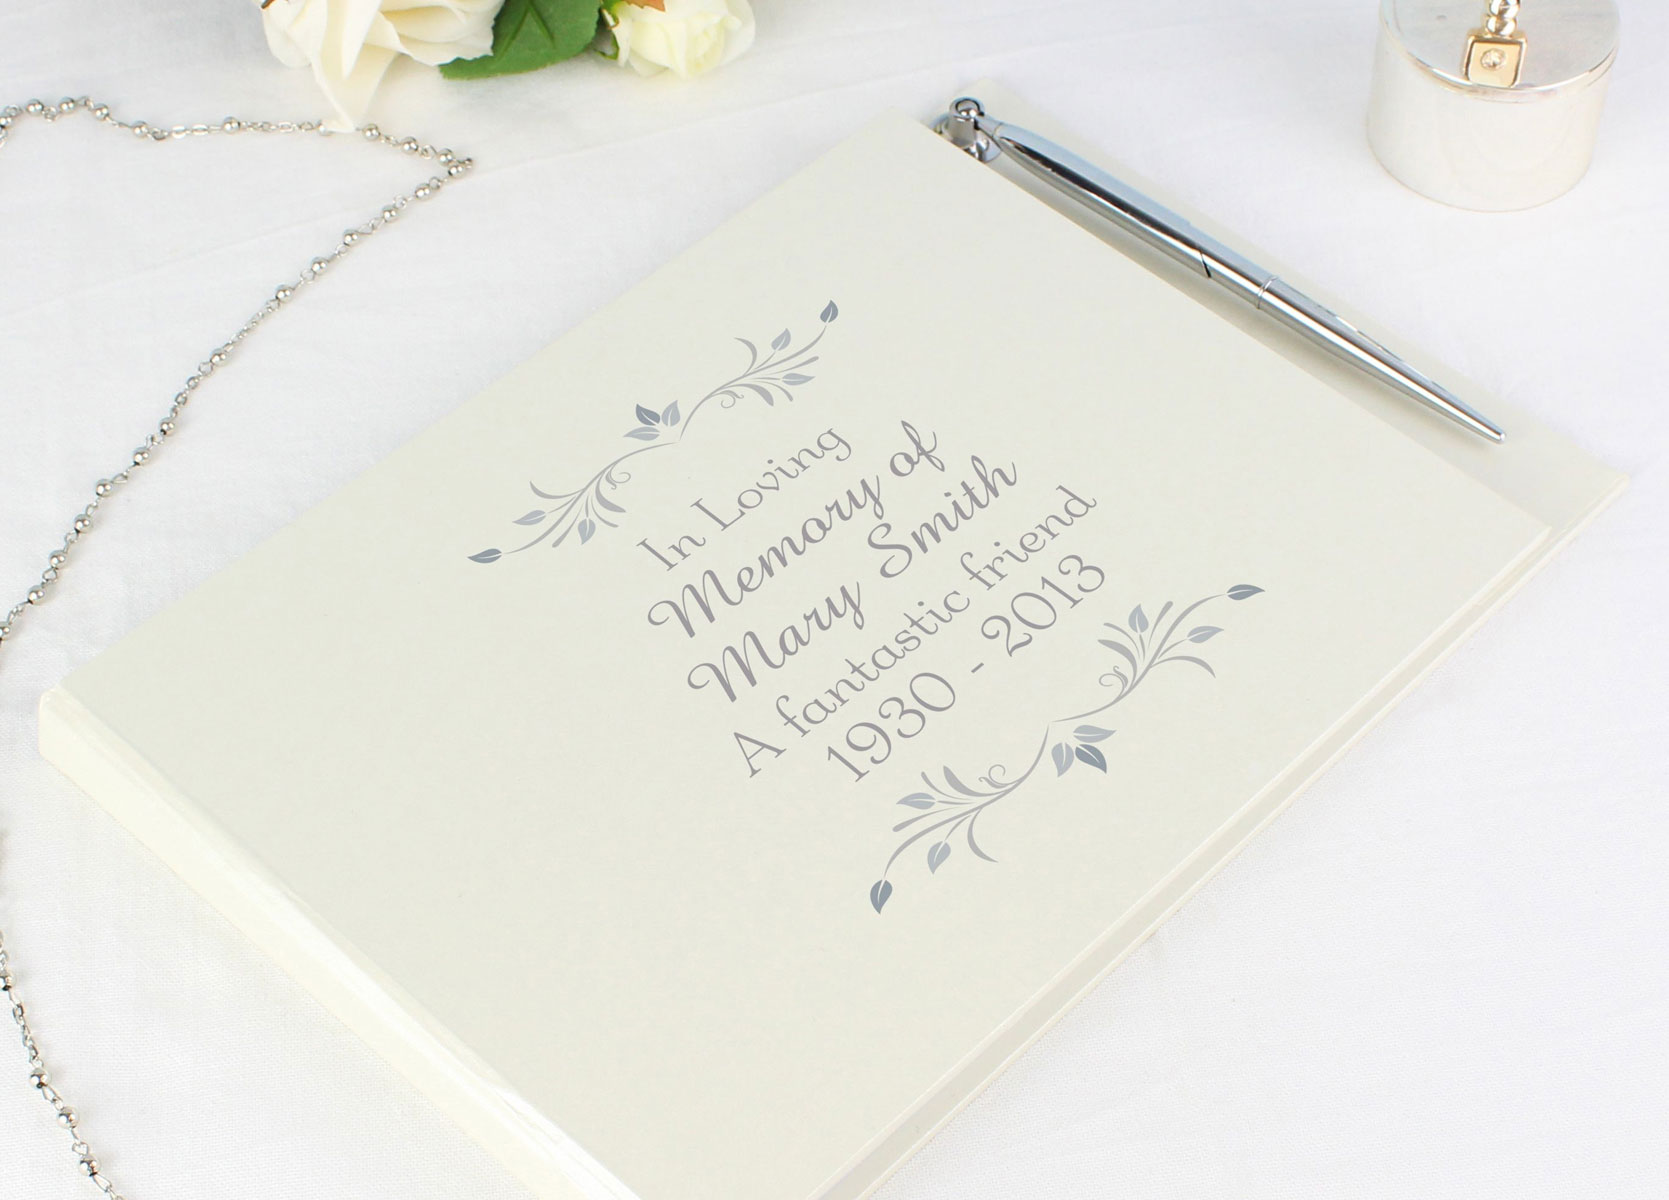 Condolence Book/Guest Book